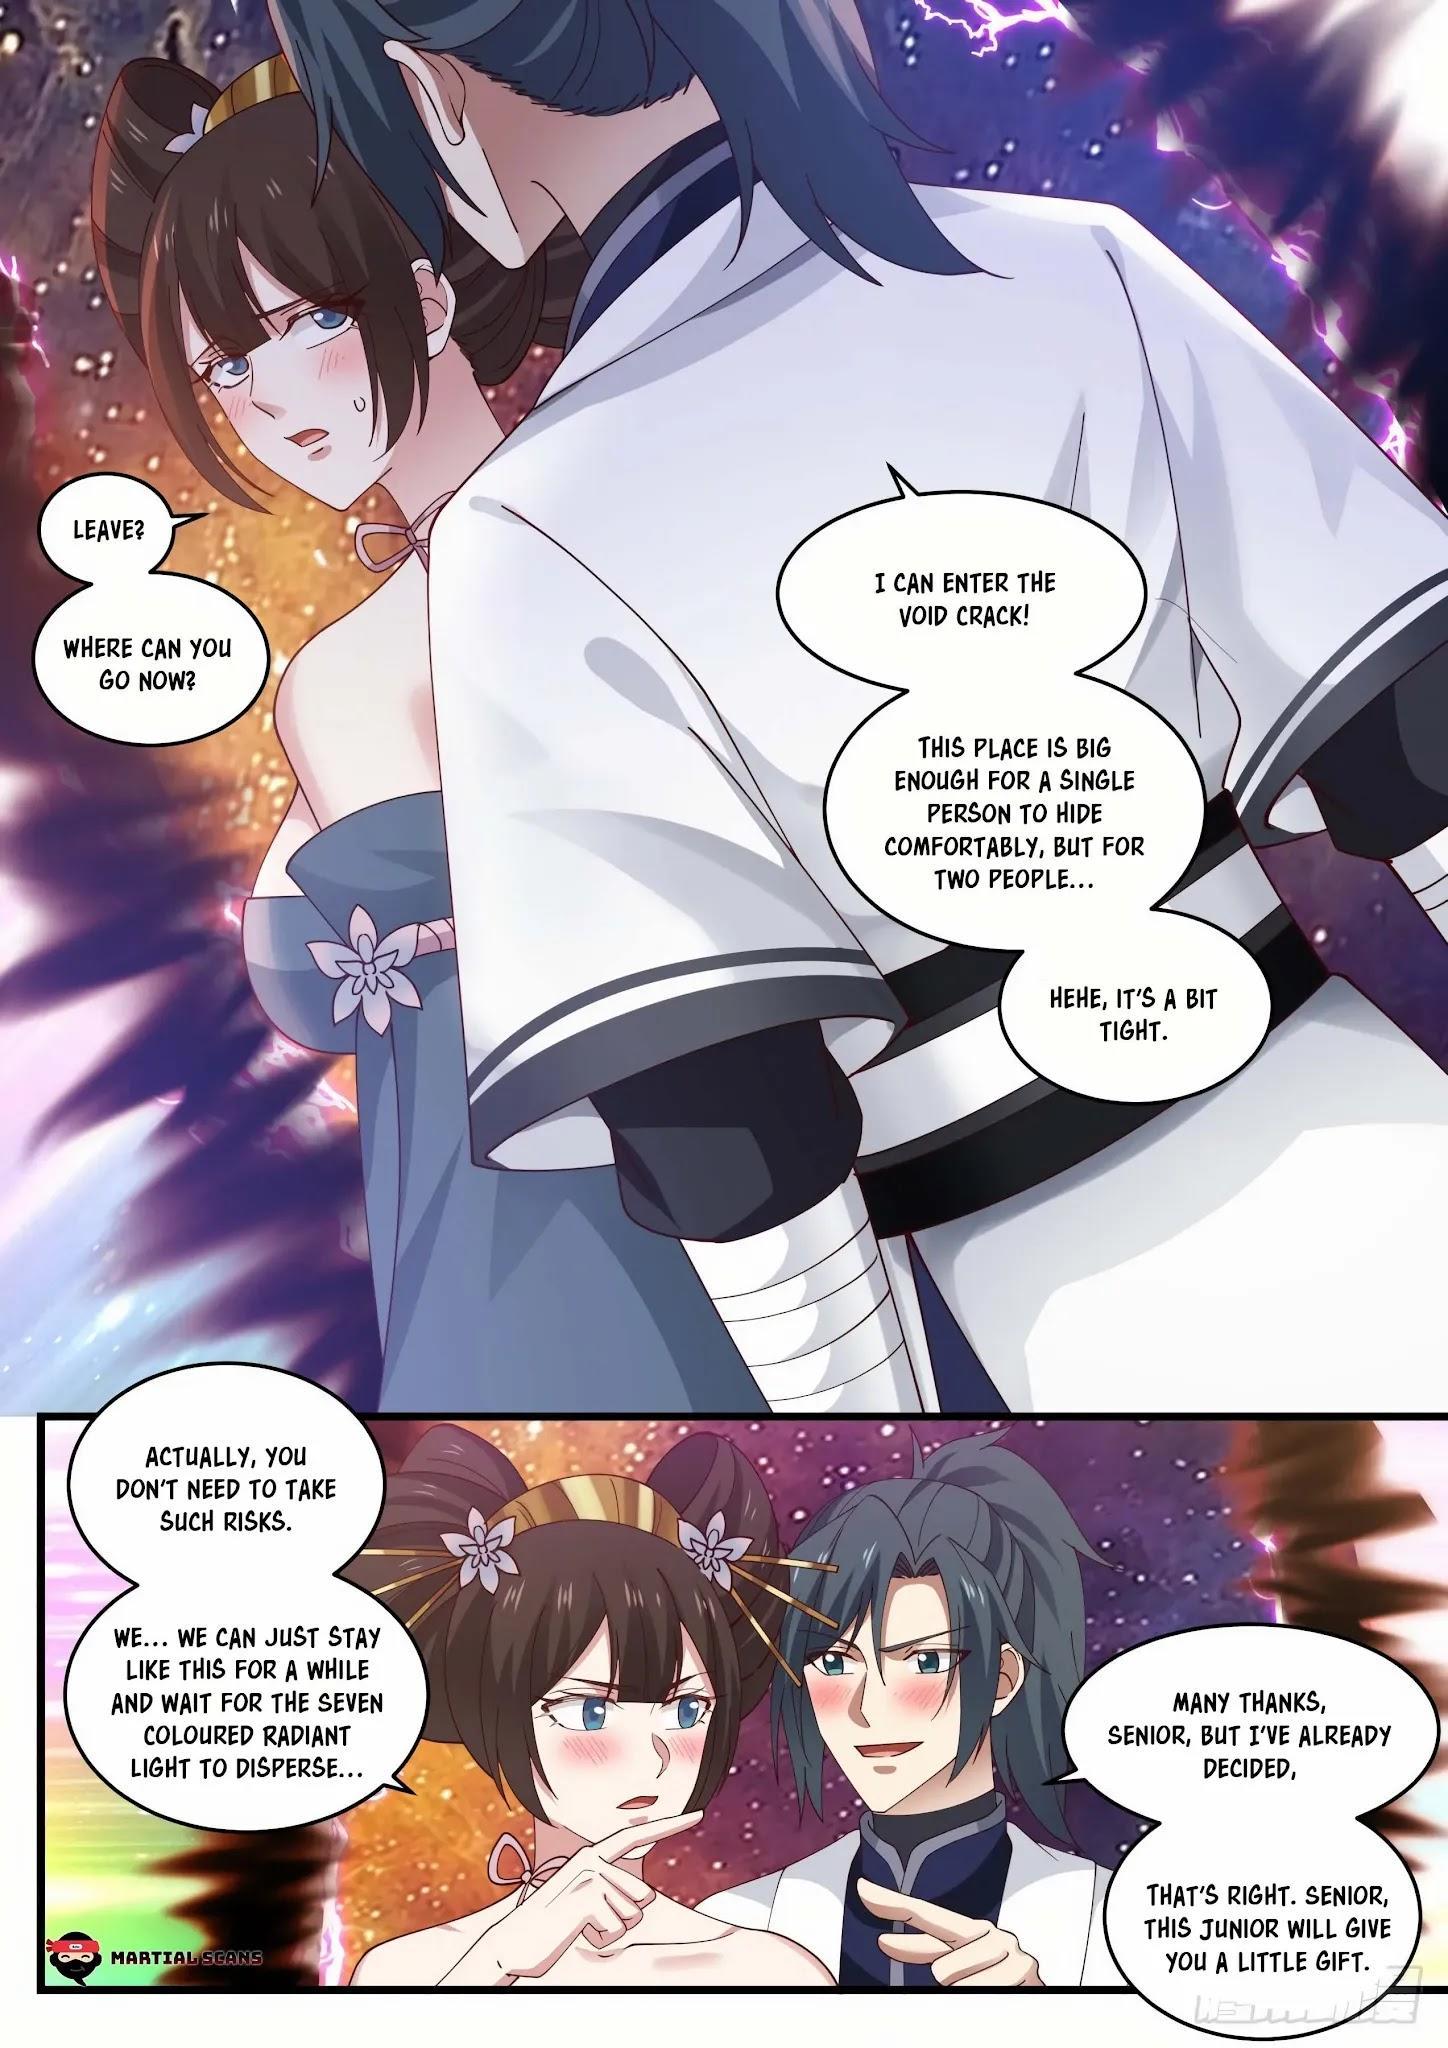 Martial Peak Chapter 1465: A Bit Tight page 9 - Mangakakalot